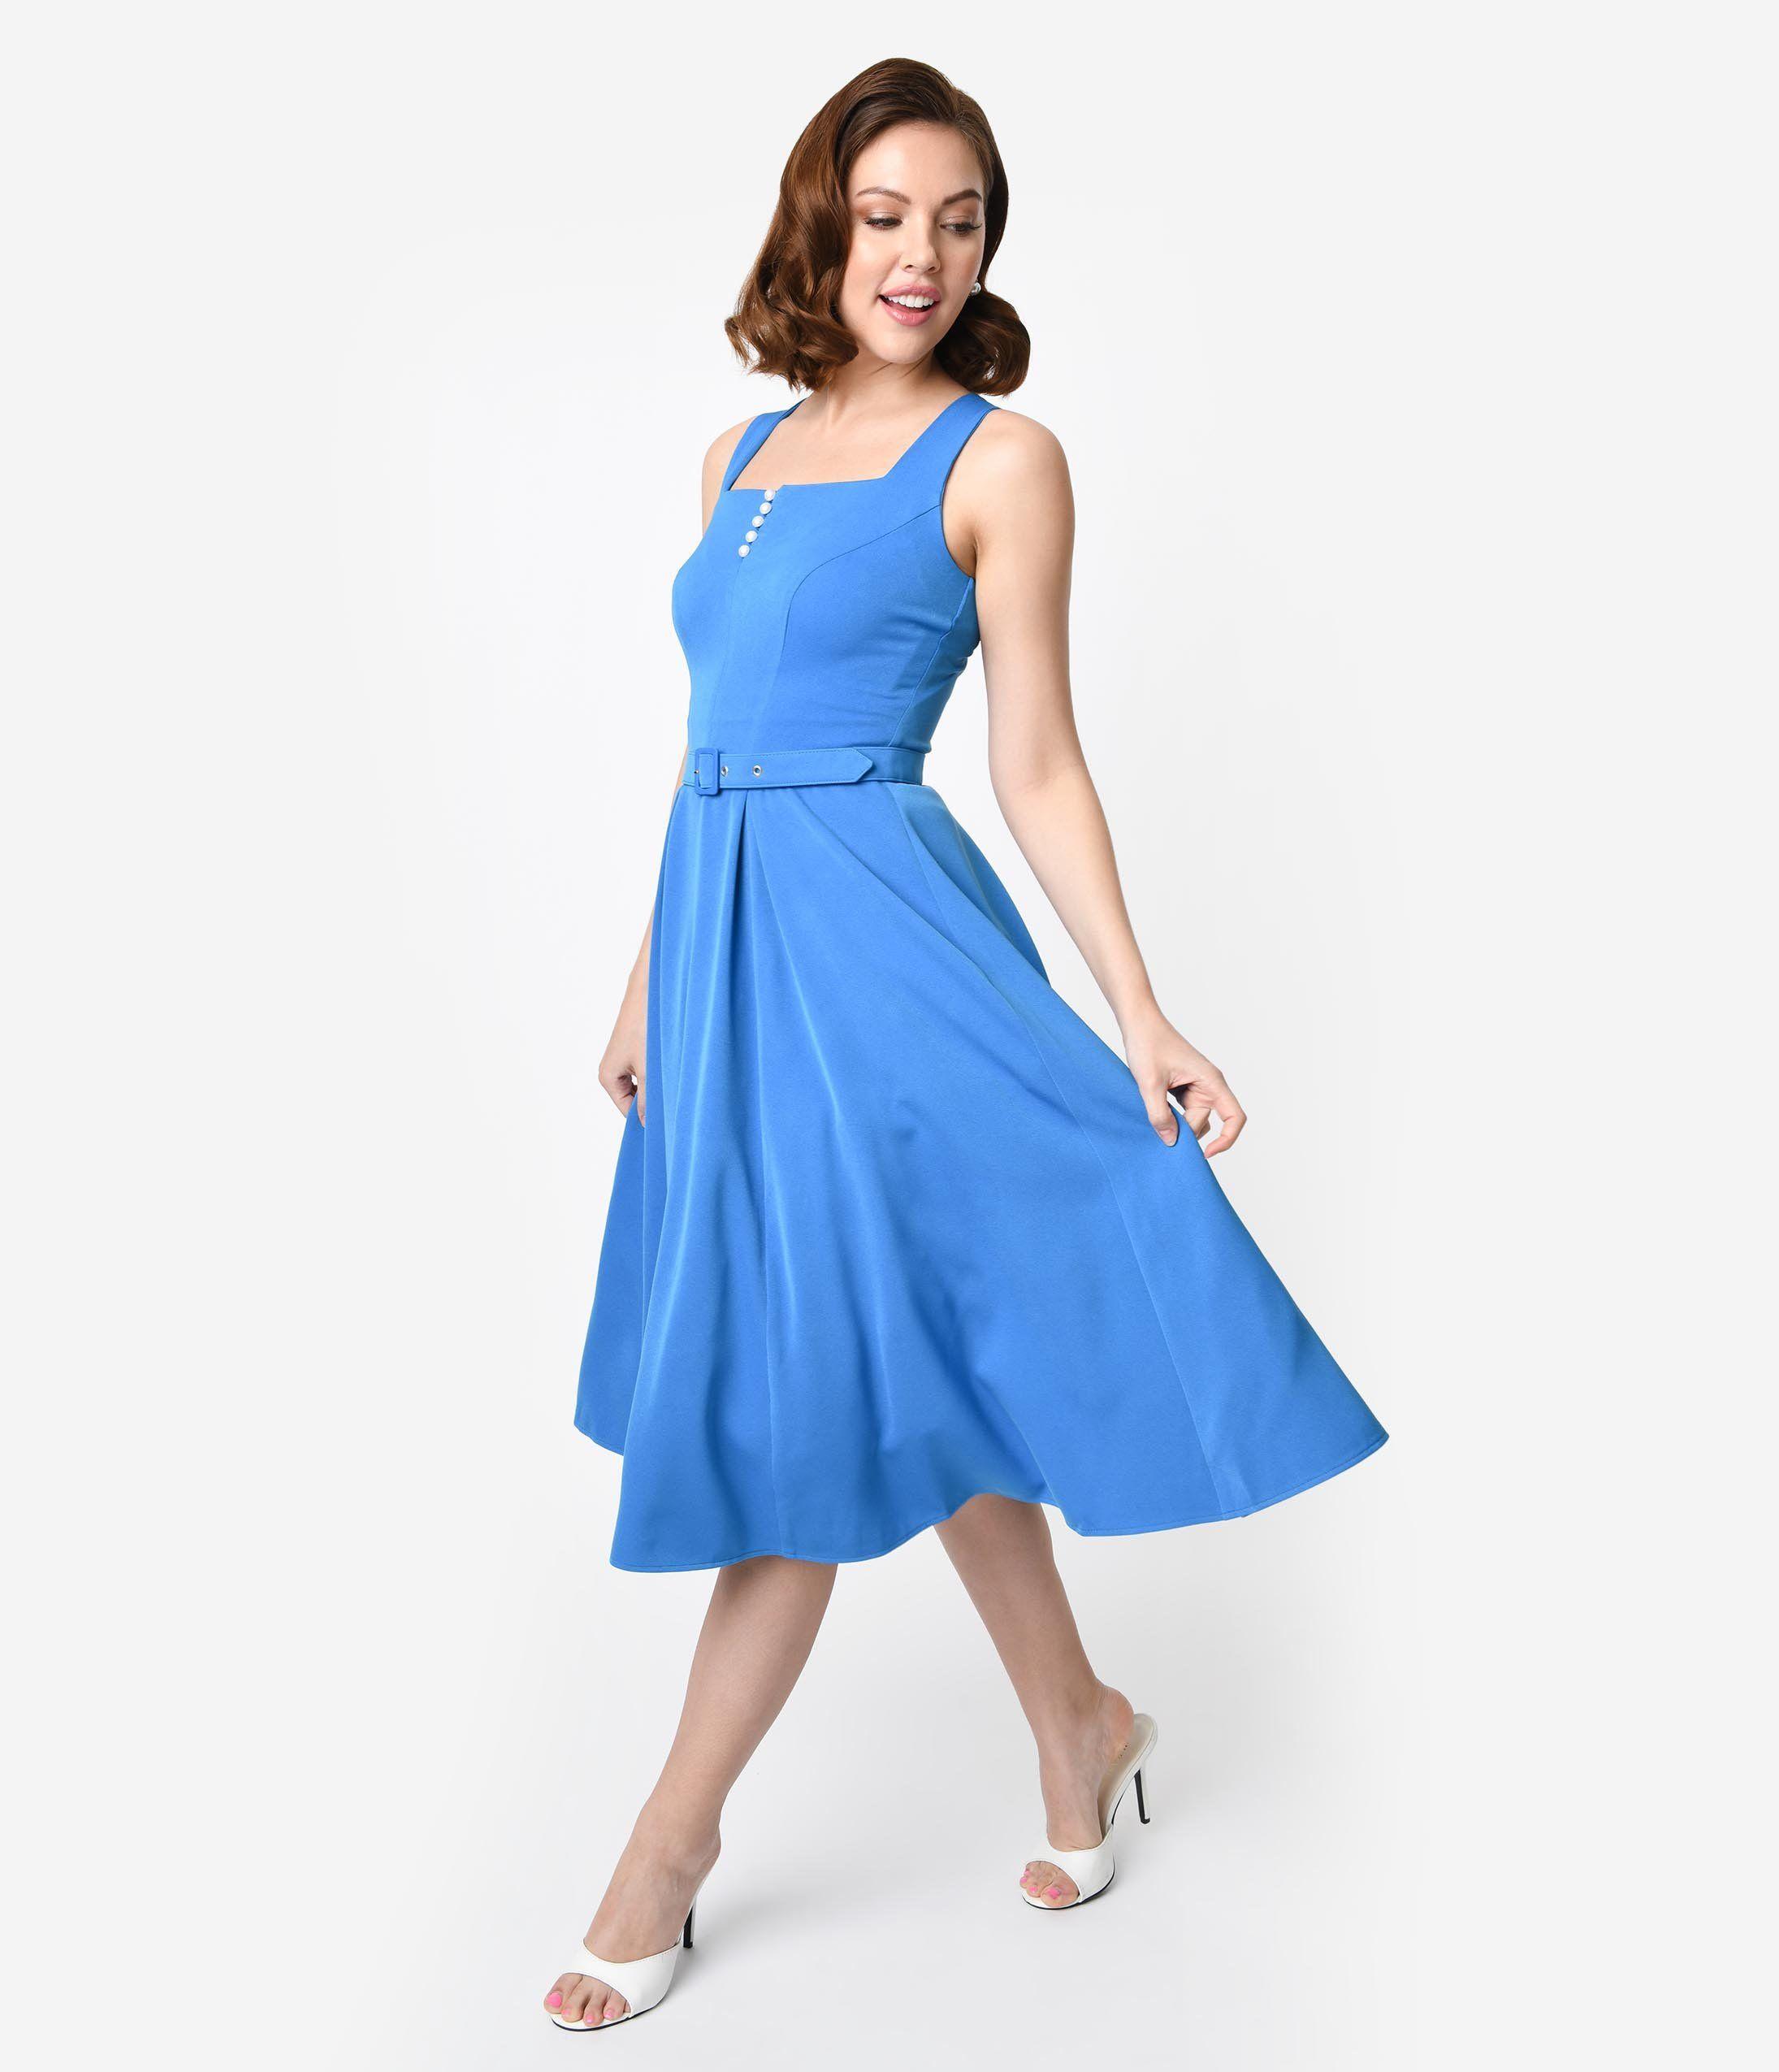 1950s Dresses 50s Dresses 1950s Style Dresses 1950s Fashion Dresses Vintage Inspired Dresses 1950s Fashion [ 2550 x 2190 Pixel ]